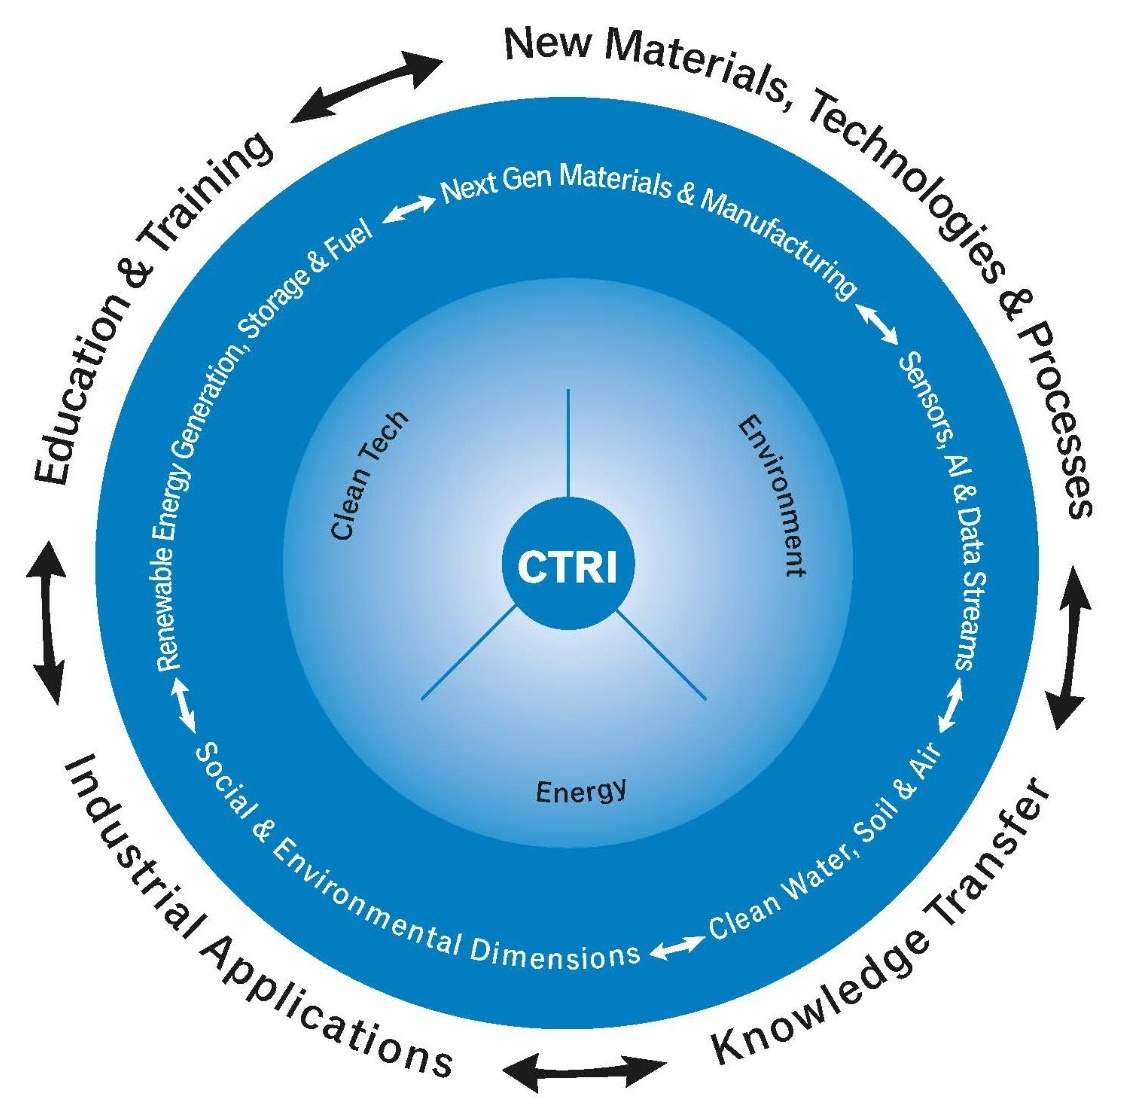 CTRI wheel